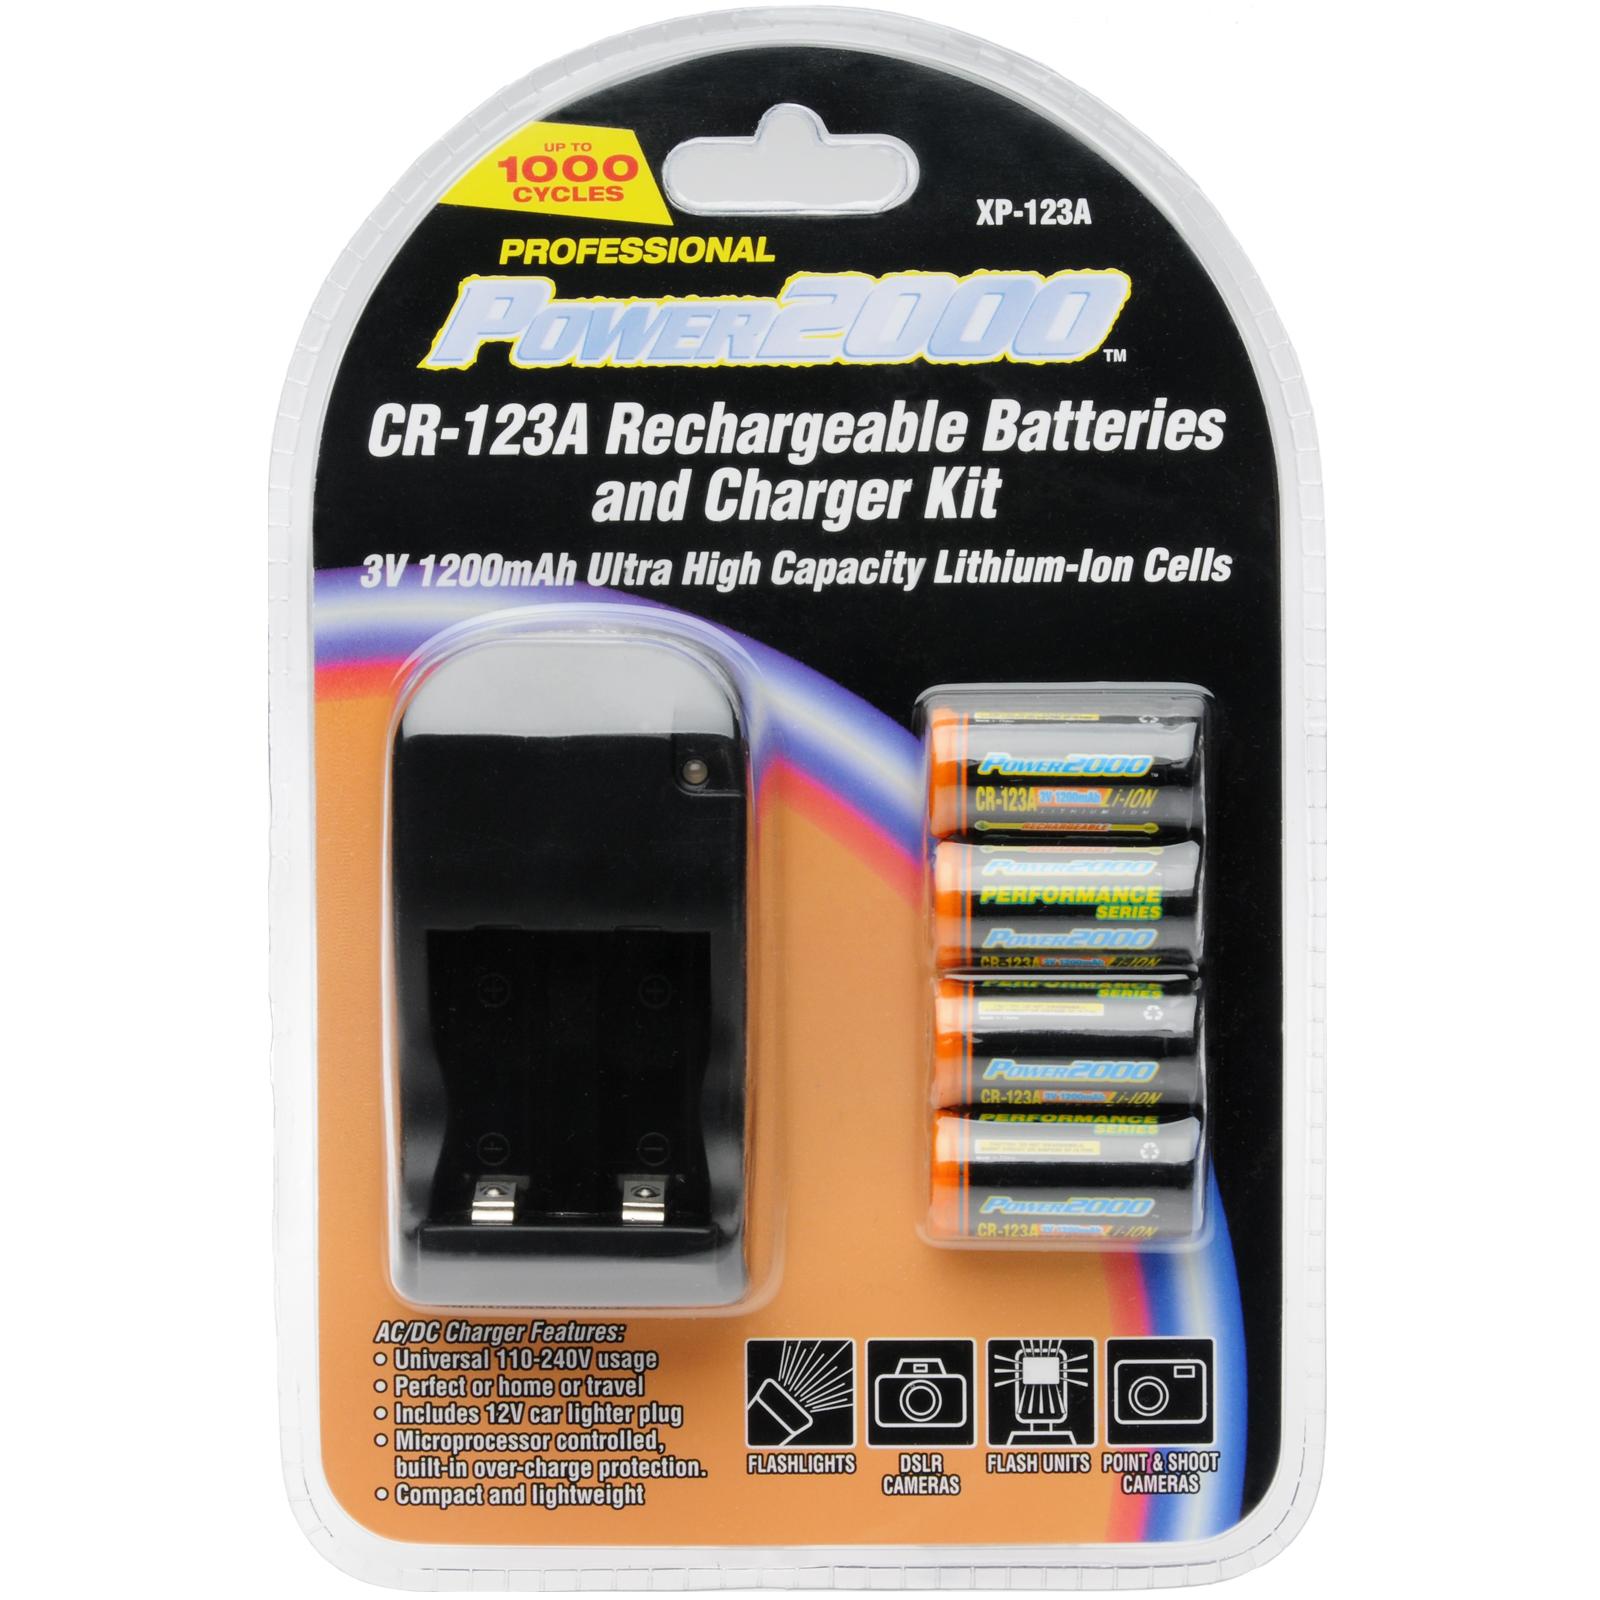 Car Battery Walmart - 2018 - 2019 New Car Reviews by ...